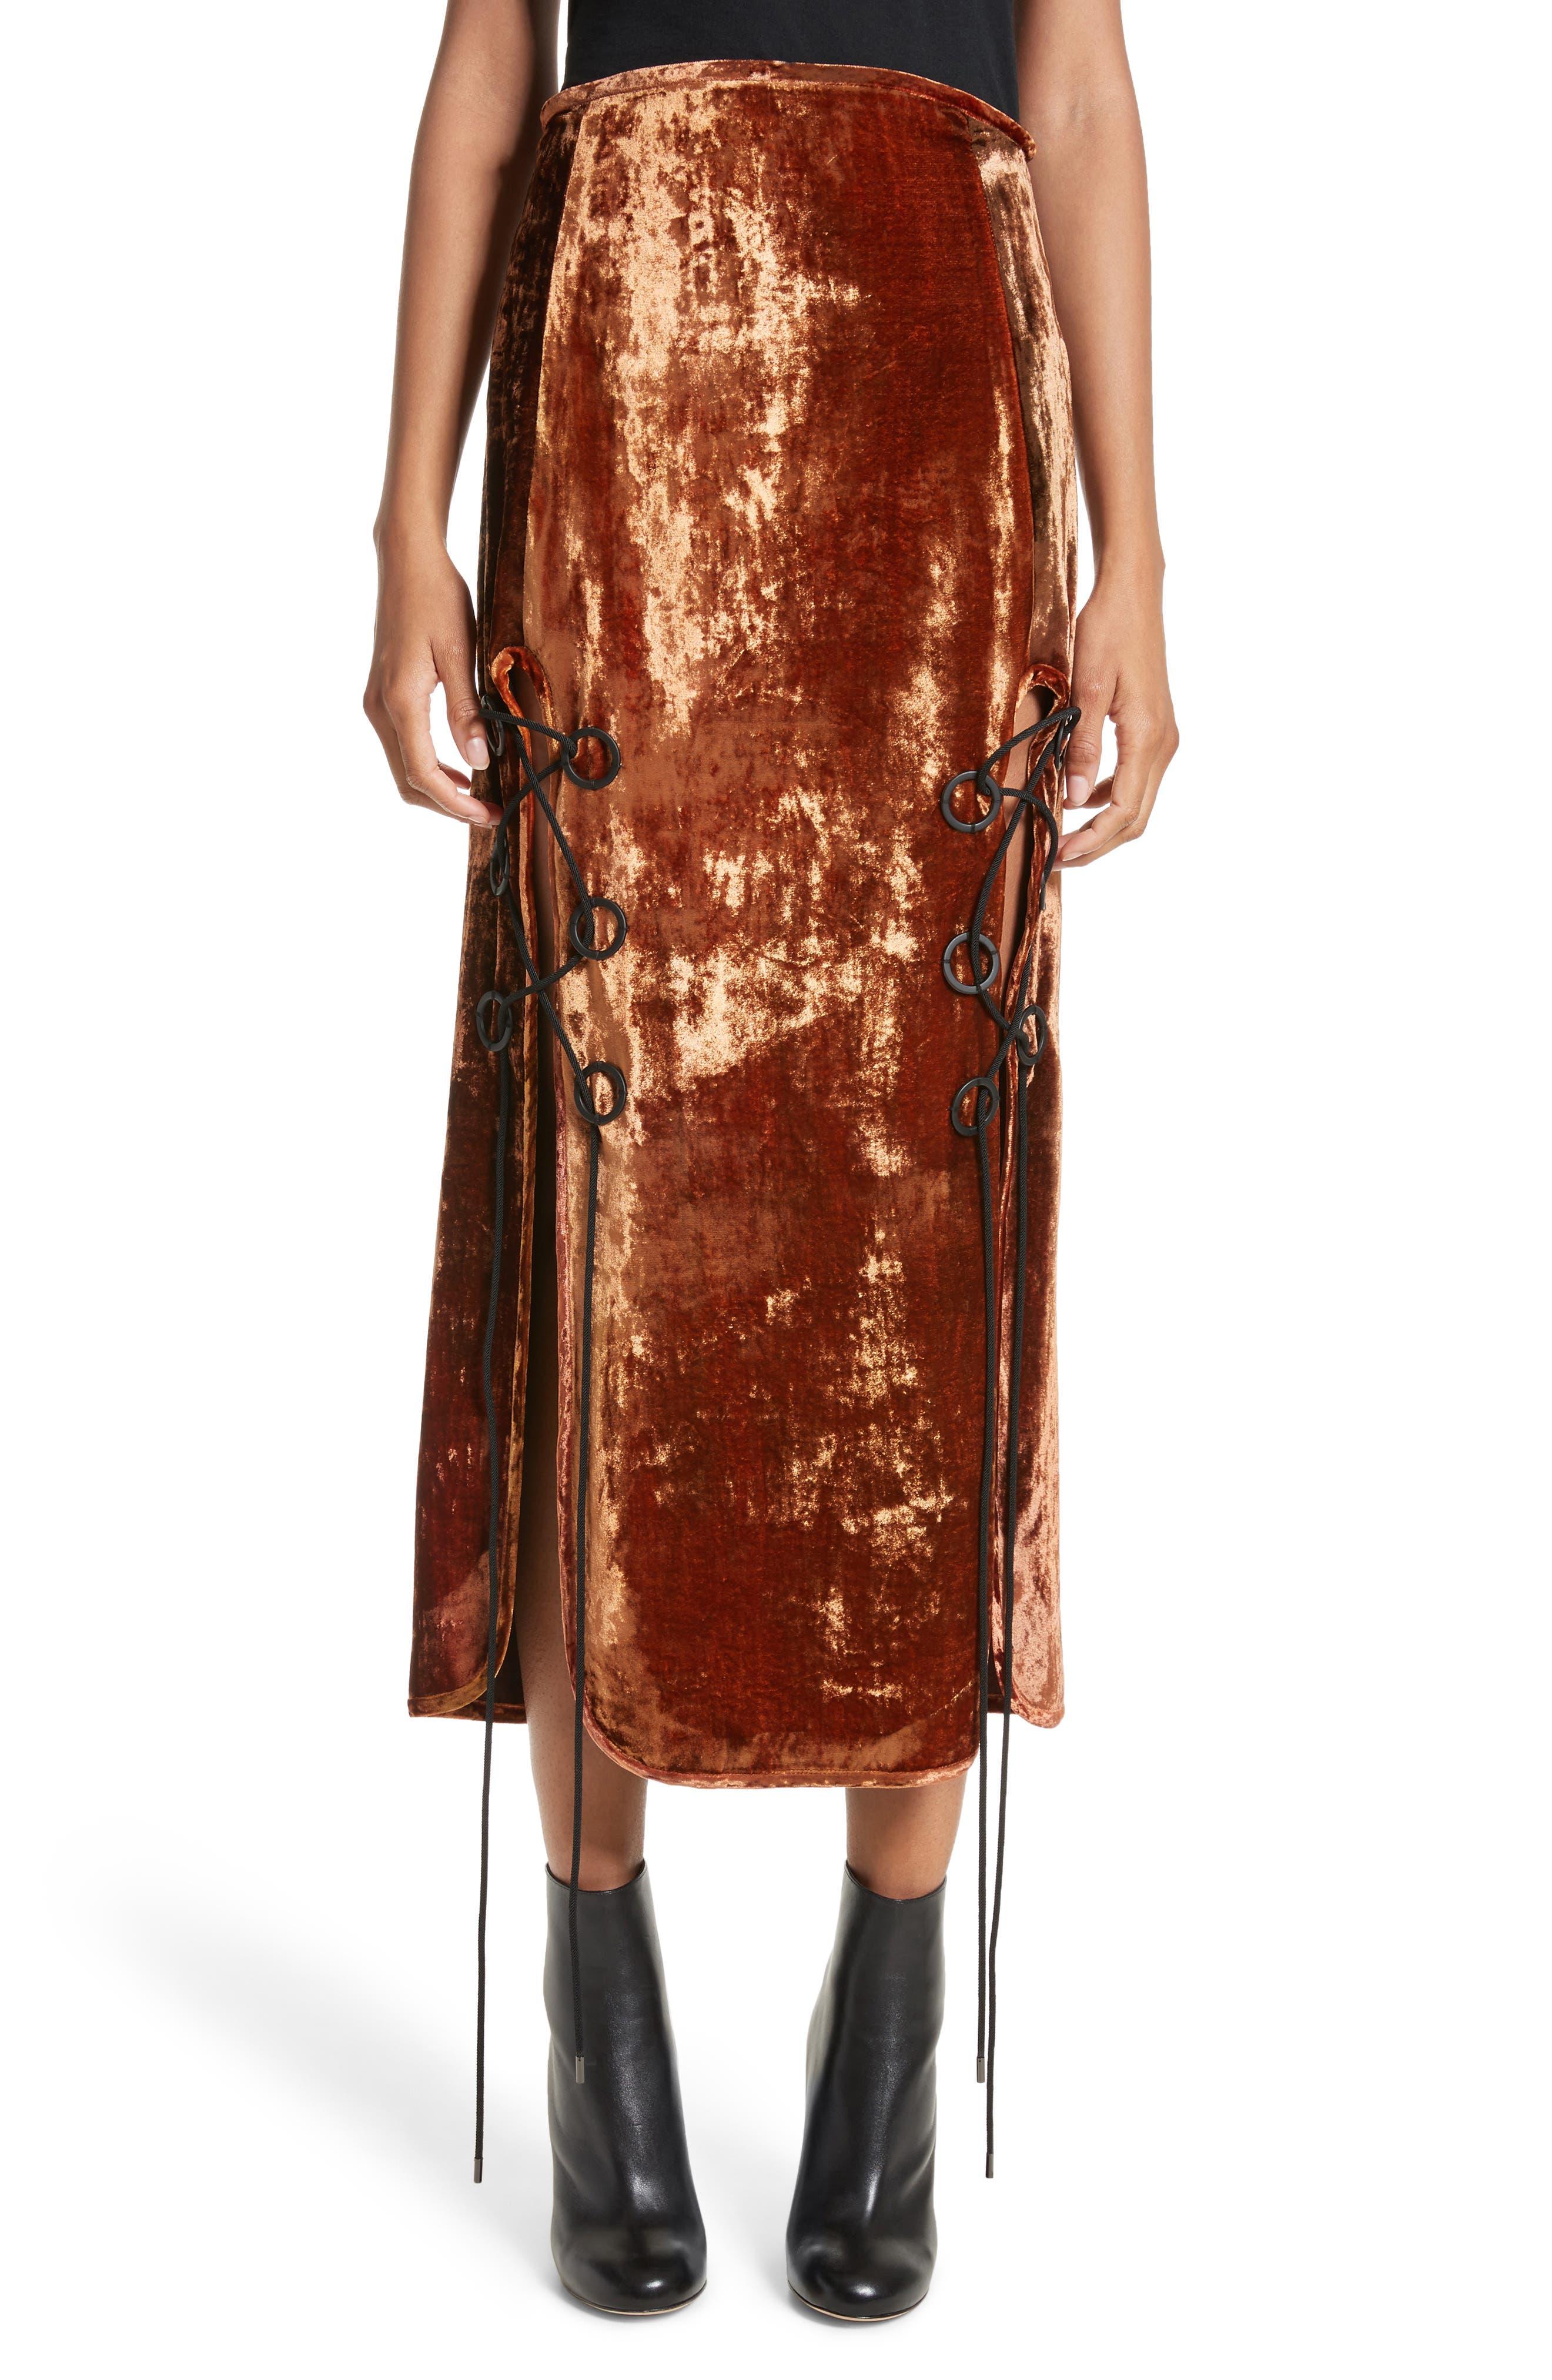 Alternate Image 1 Selected - Ellery The Blues Lace Up Crushed Velvet Midi Skirt